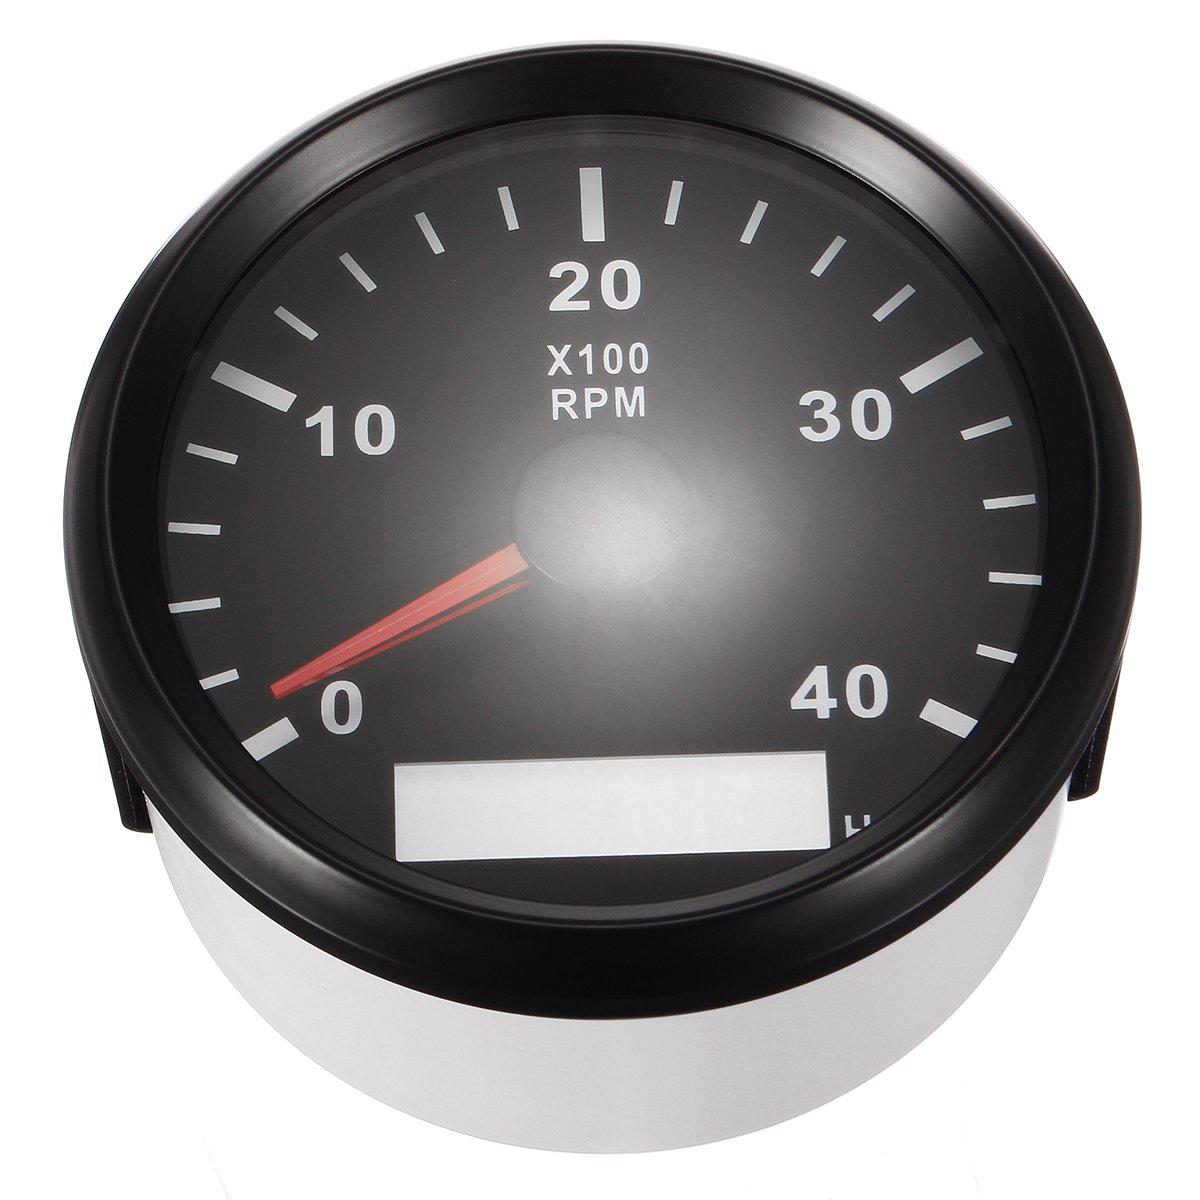 NeDonald 12/24V Marine Tachometer Boat Tacho Meter Gauge LCD Hourmeter 0-4000 RPM 85mm by NeDonald (Image #1)